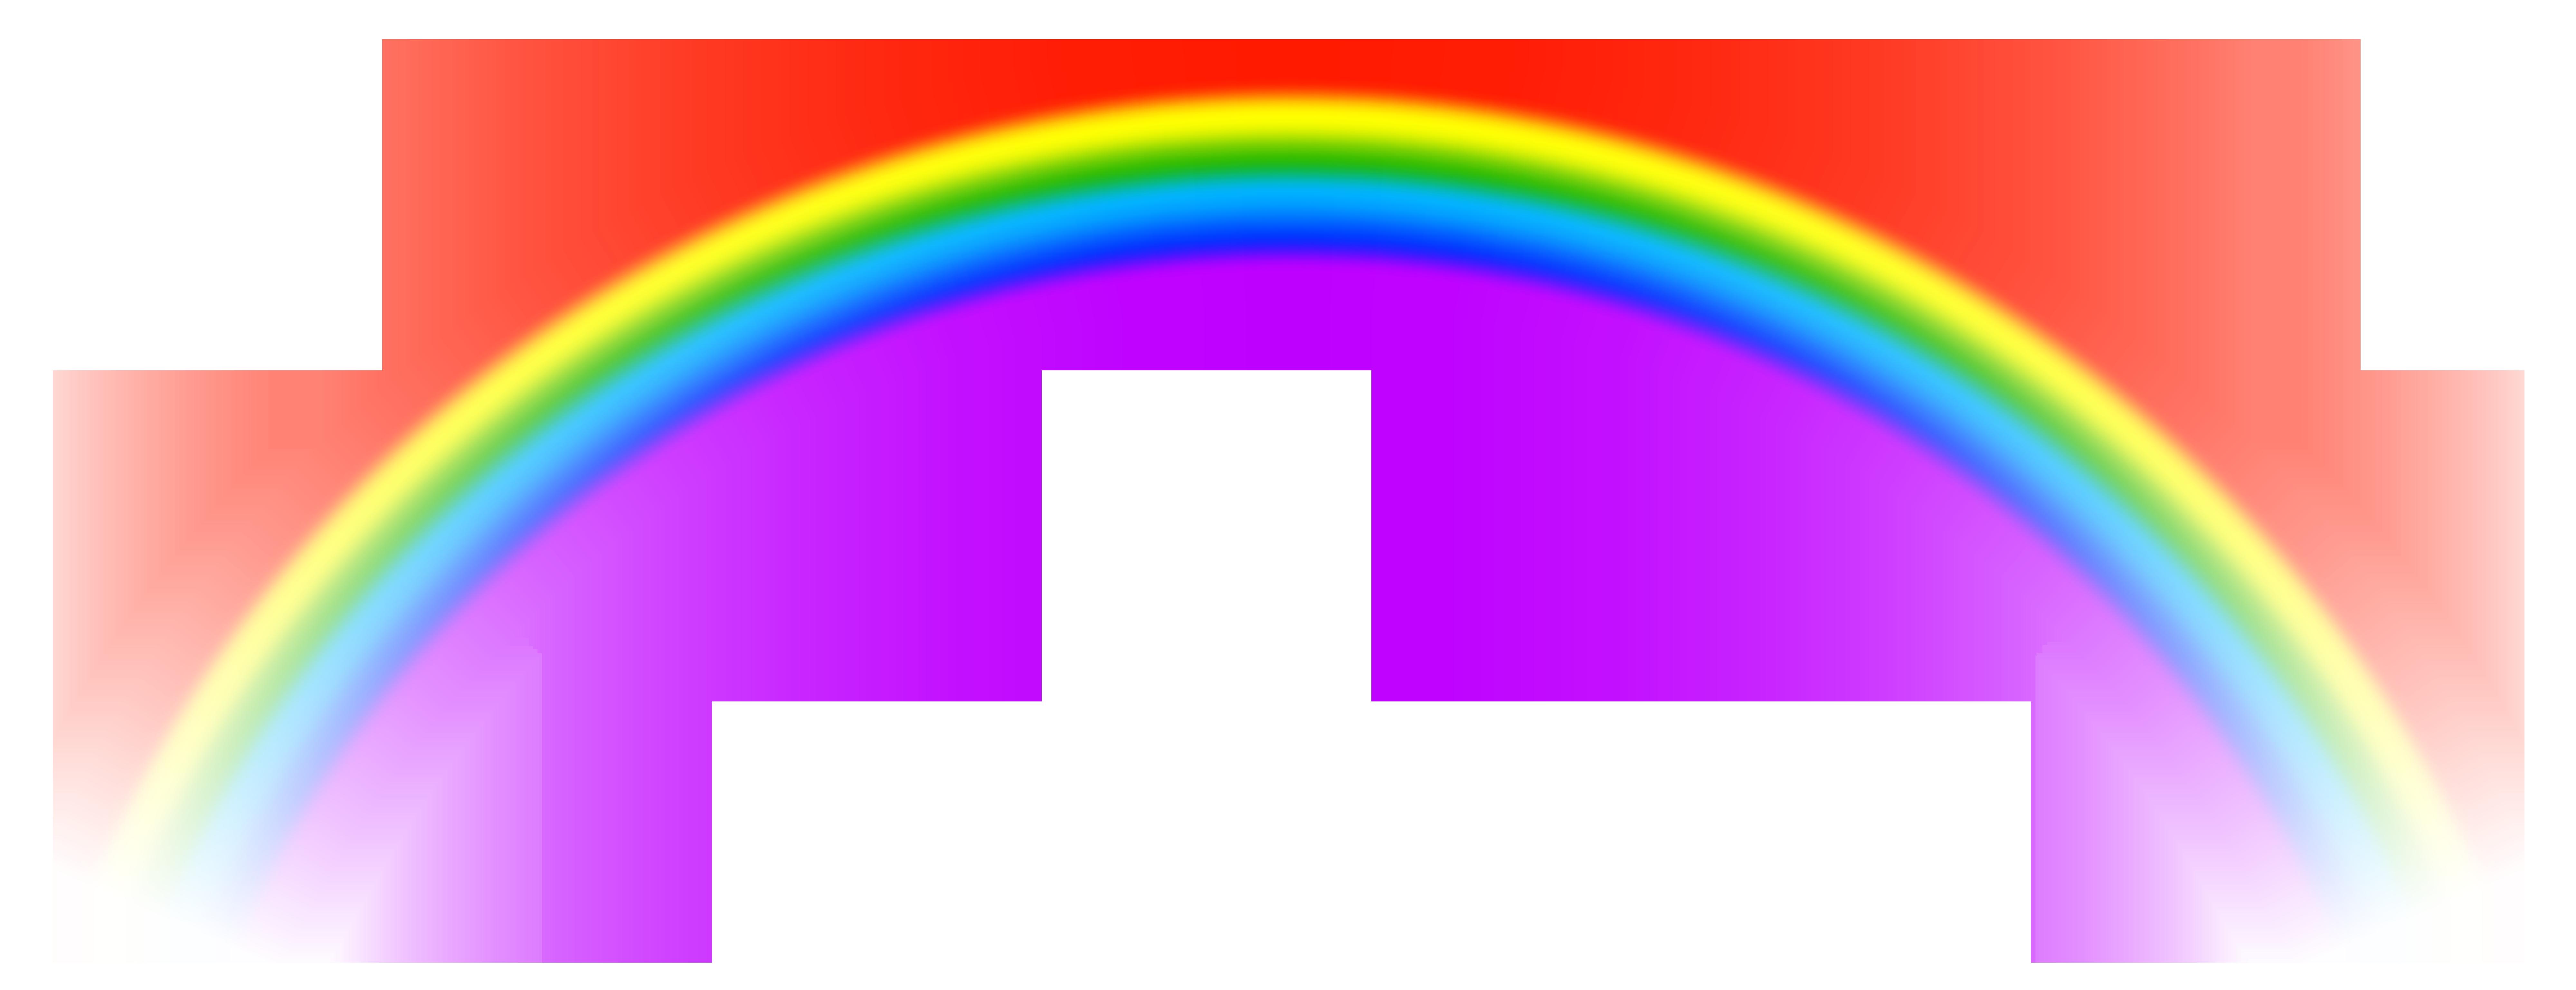 Transparent Rainbow PNG Free Clip Art Image.